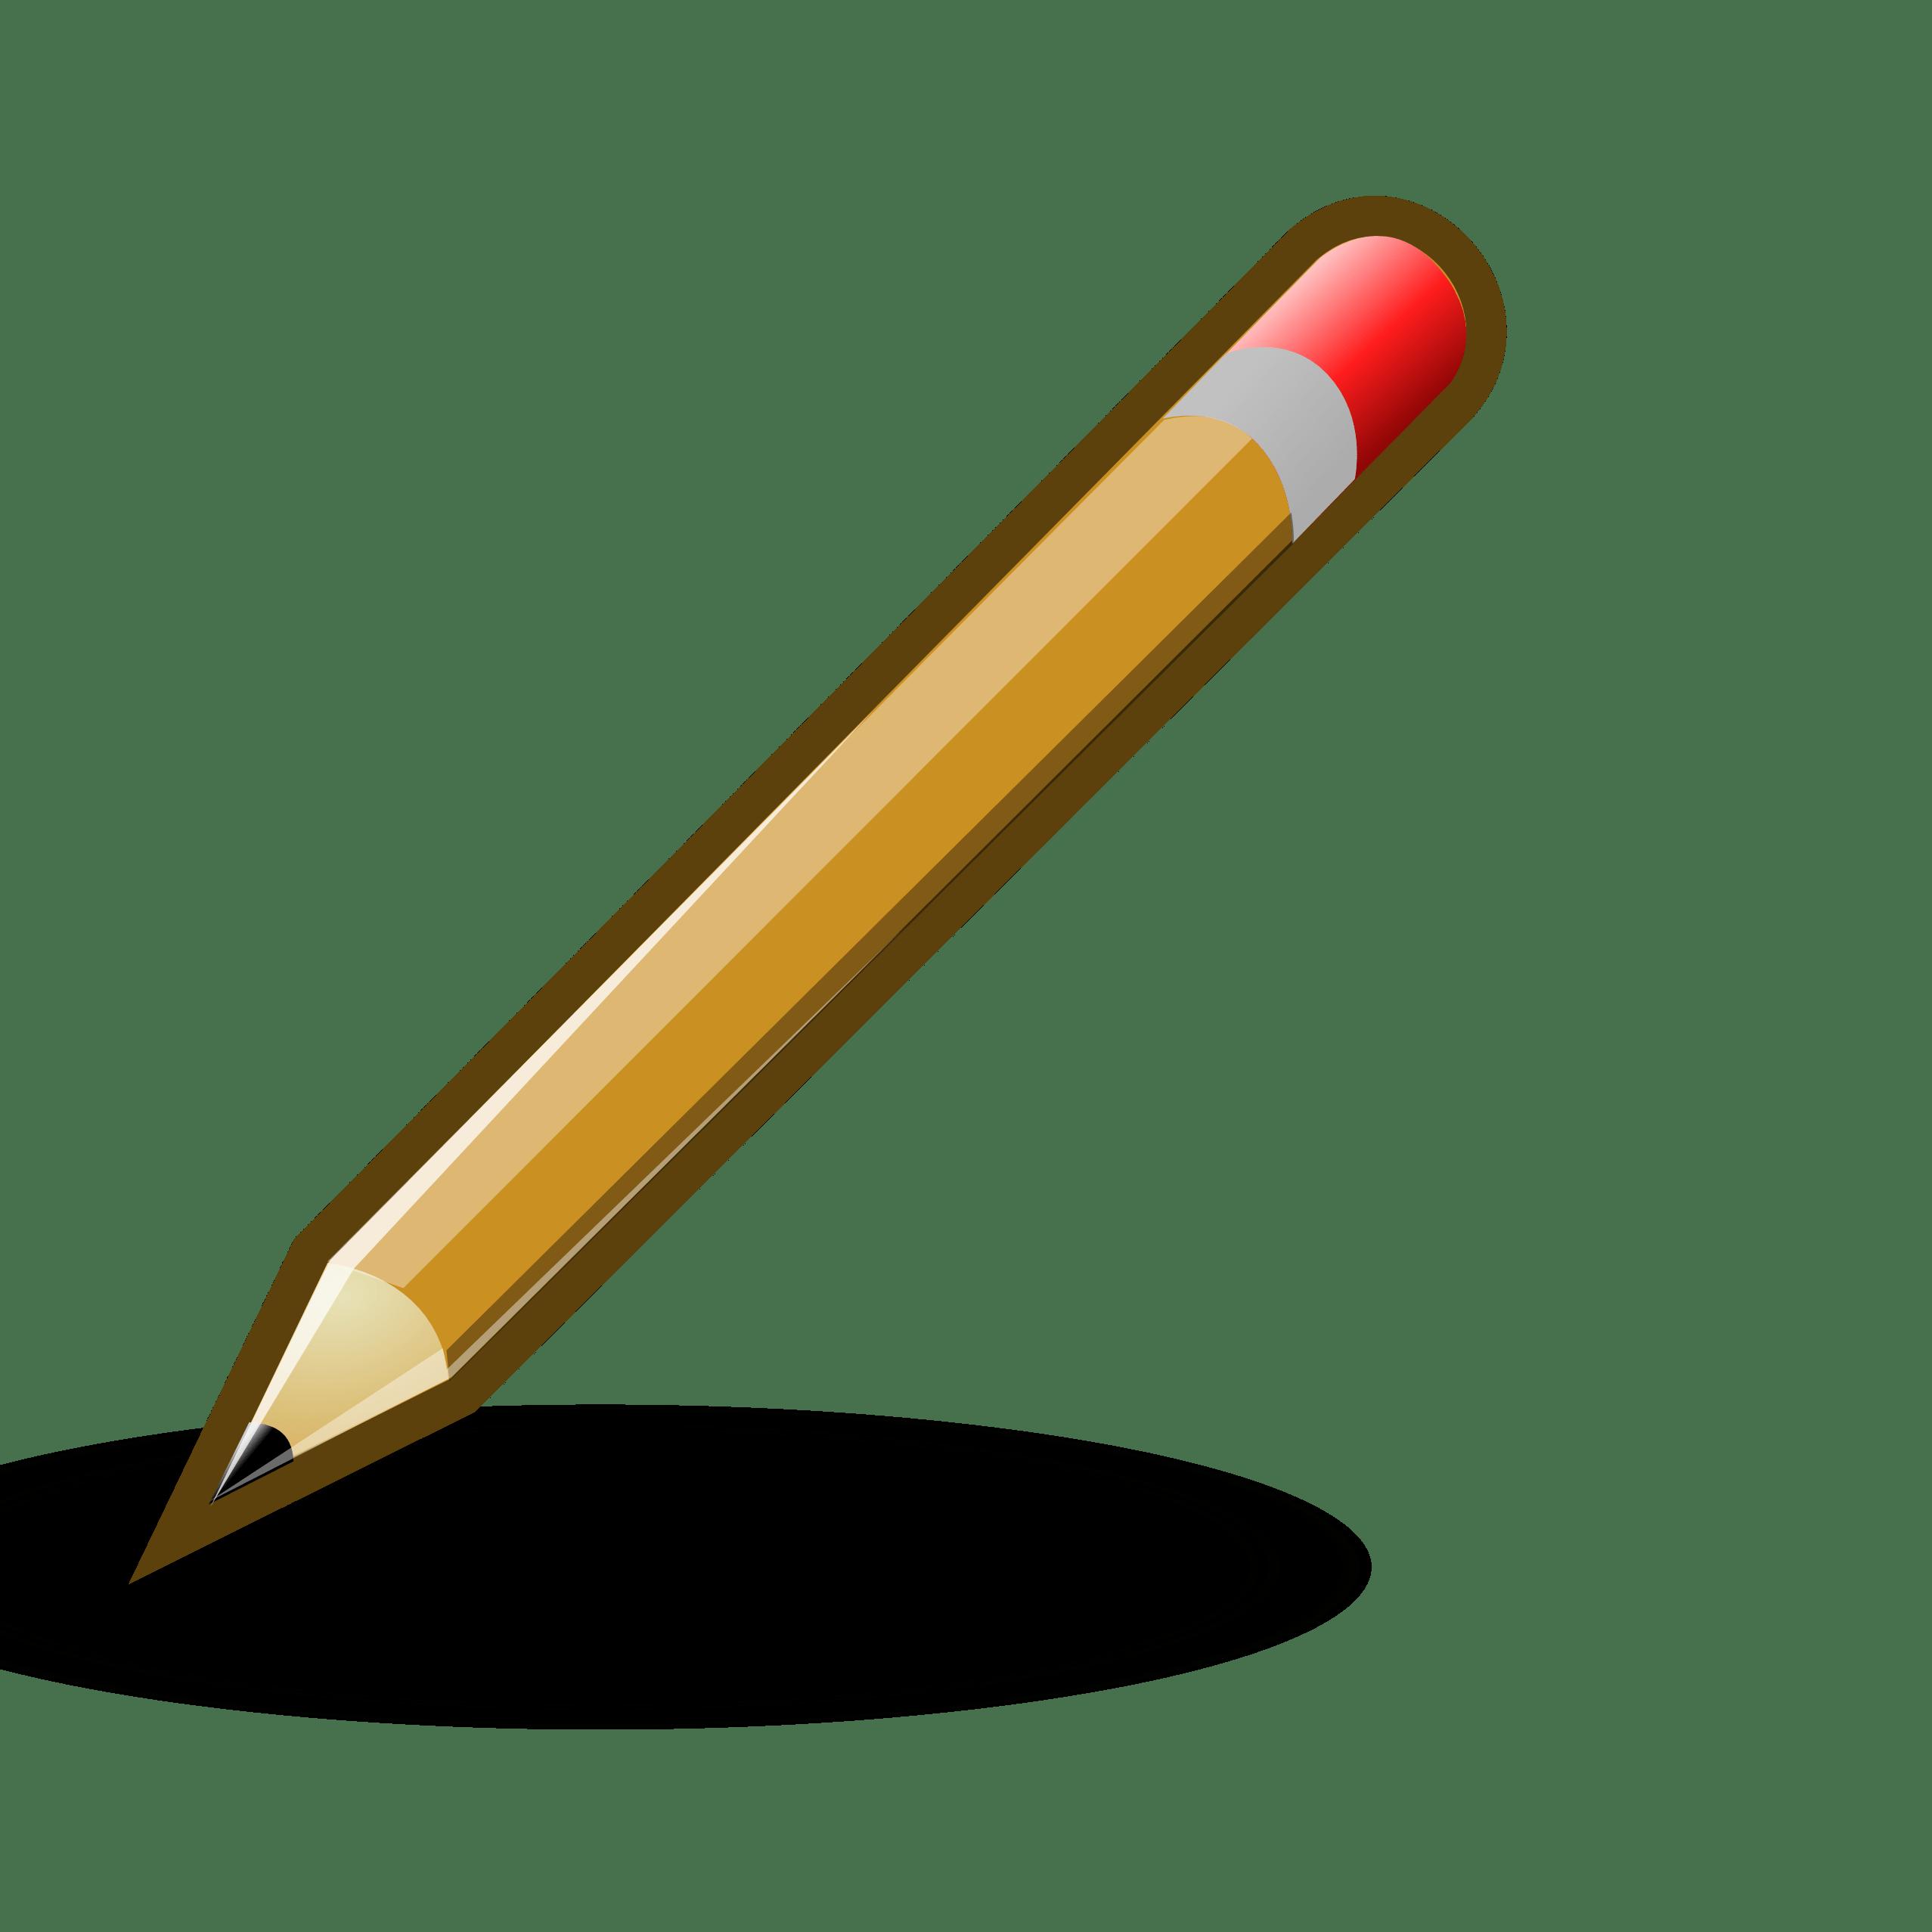 Pencil Drawing Clipart Transparent Png Stickpng